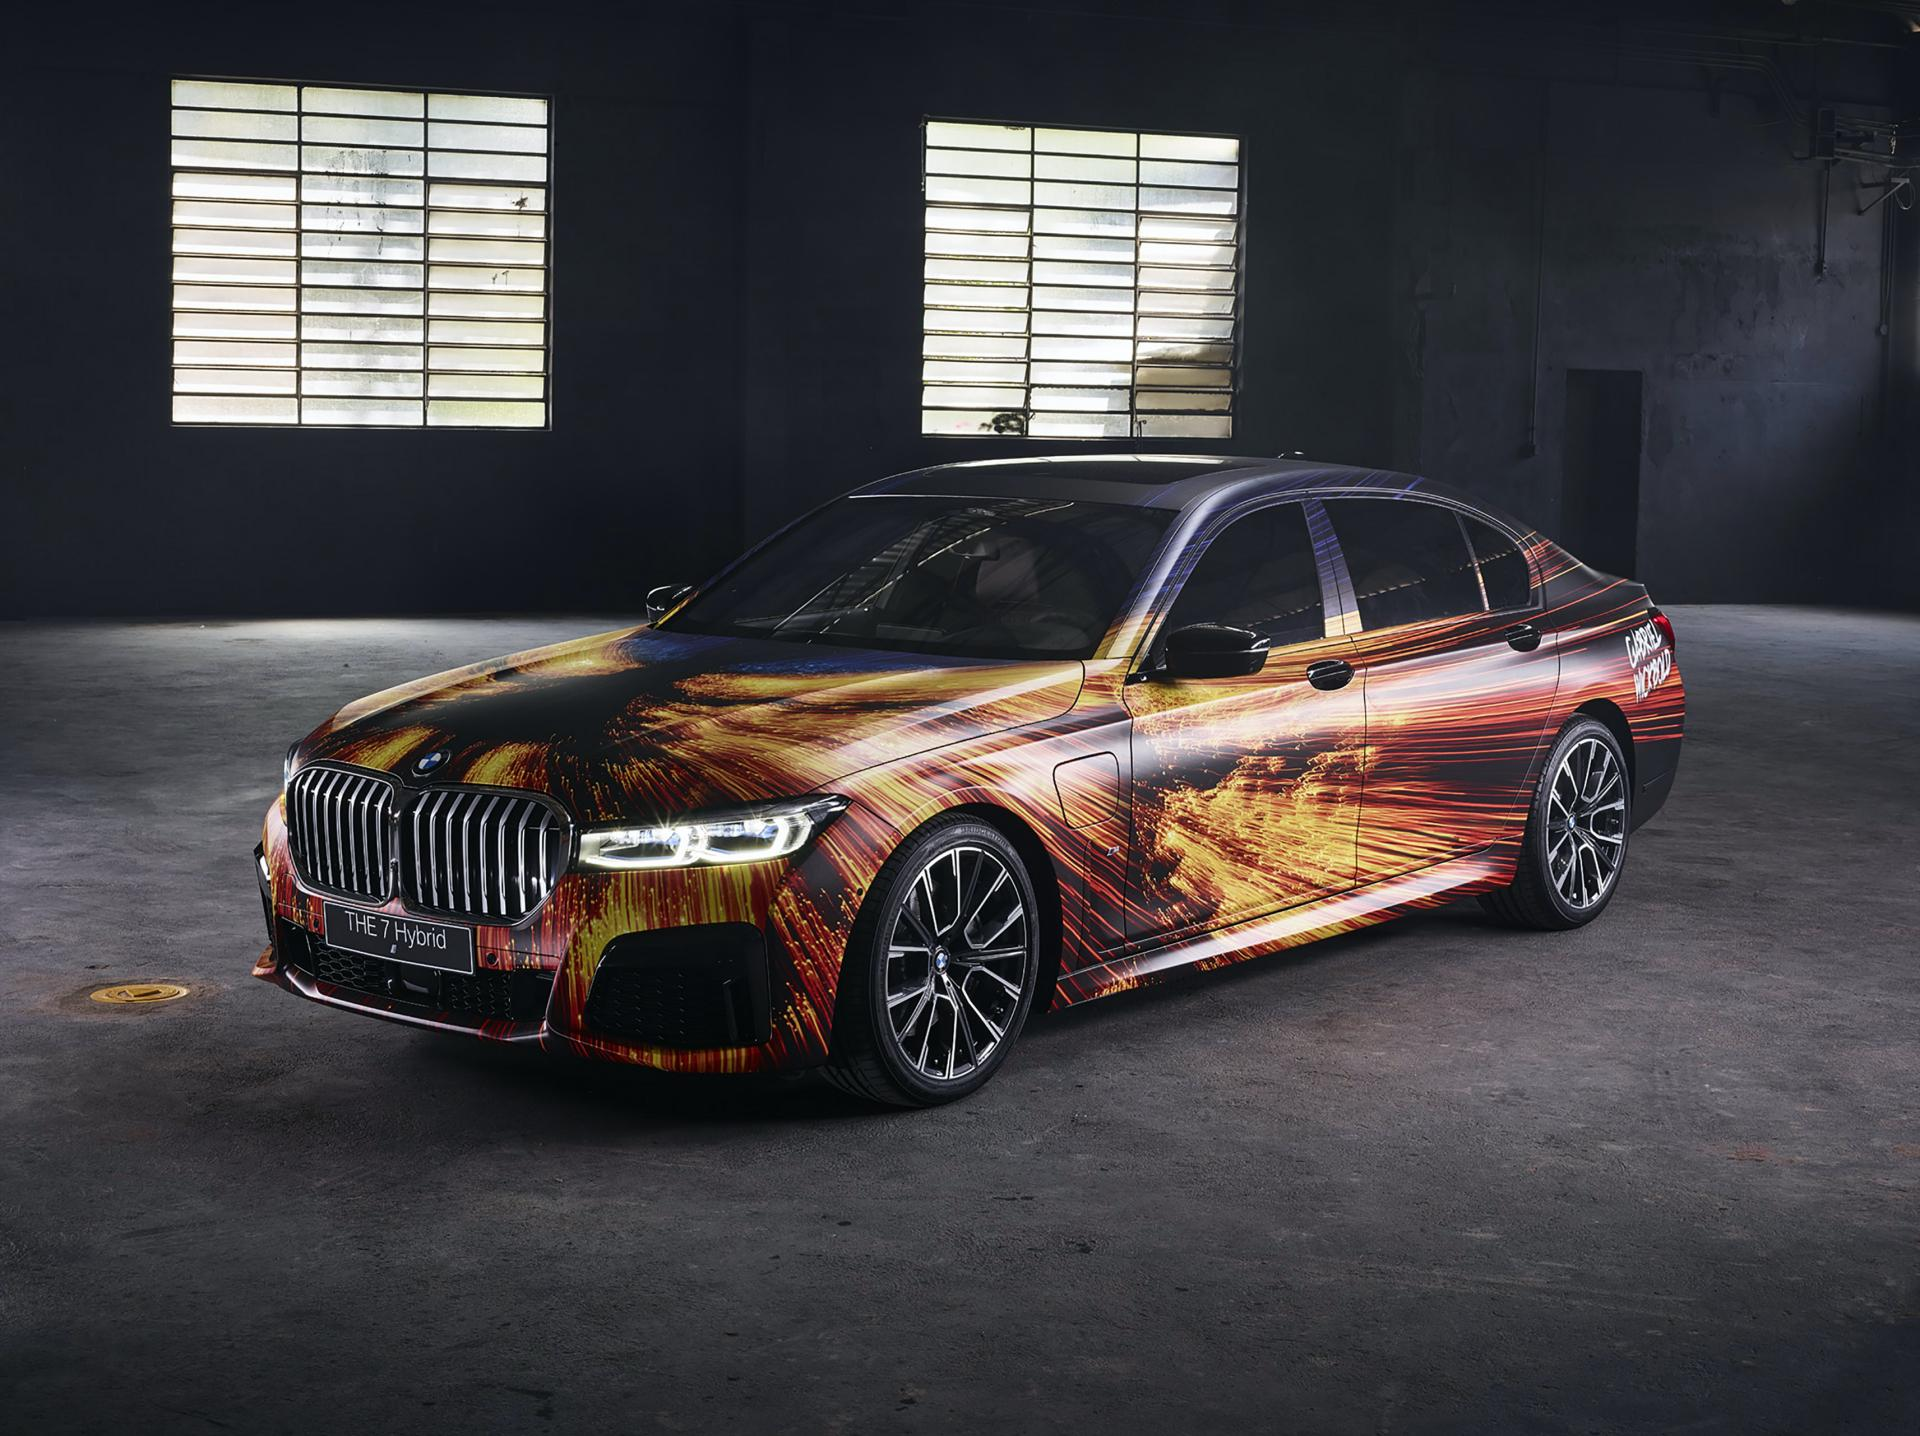 BMW-7-Series-745Le-M-Sport-Gabriel-Wickbold-Car-Art-15